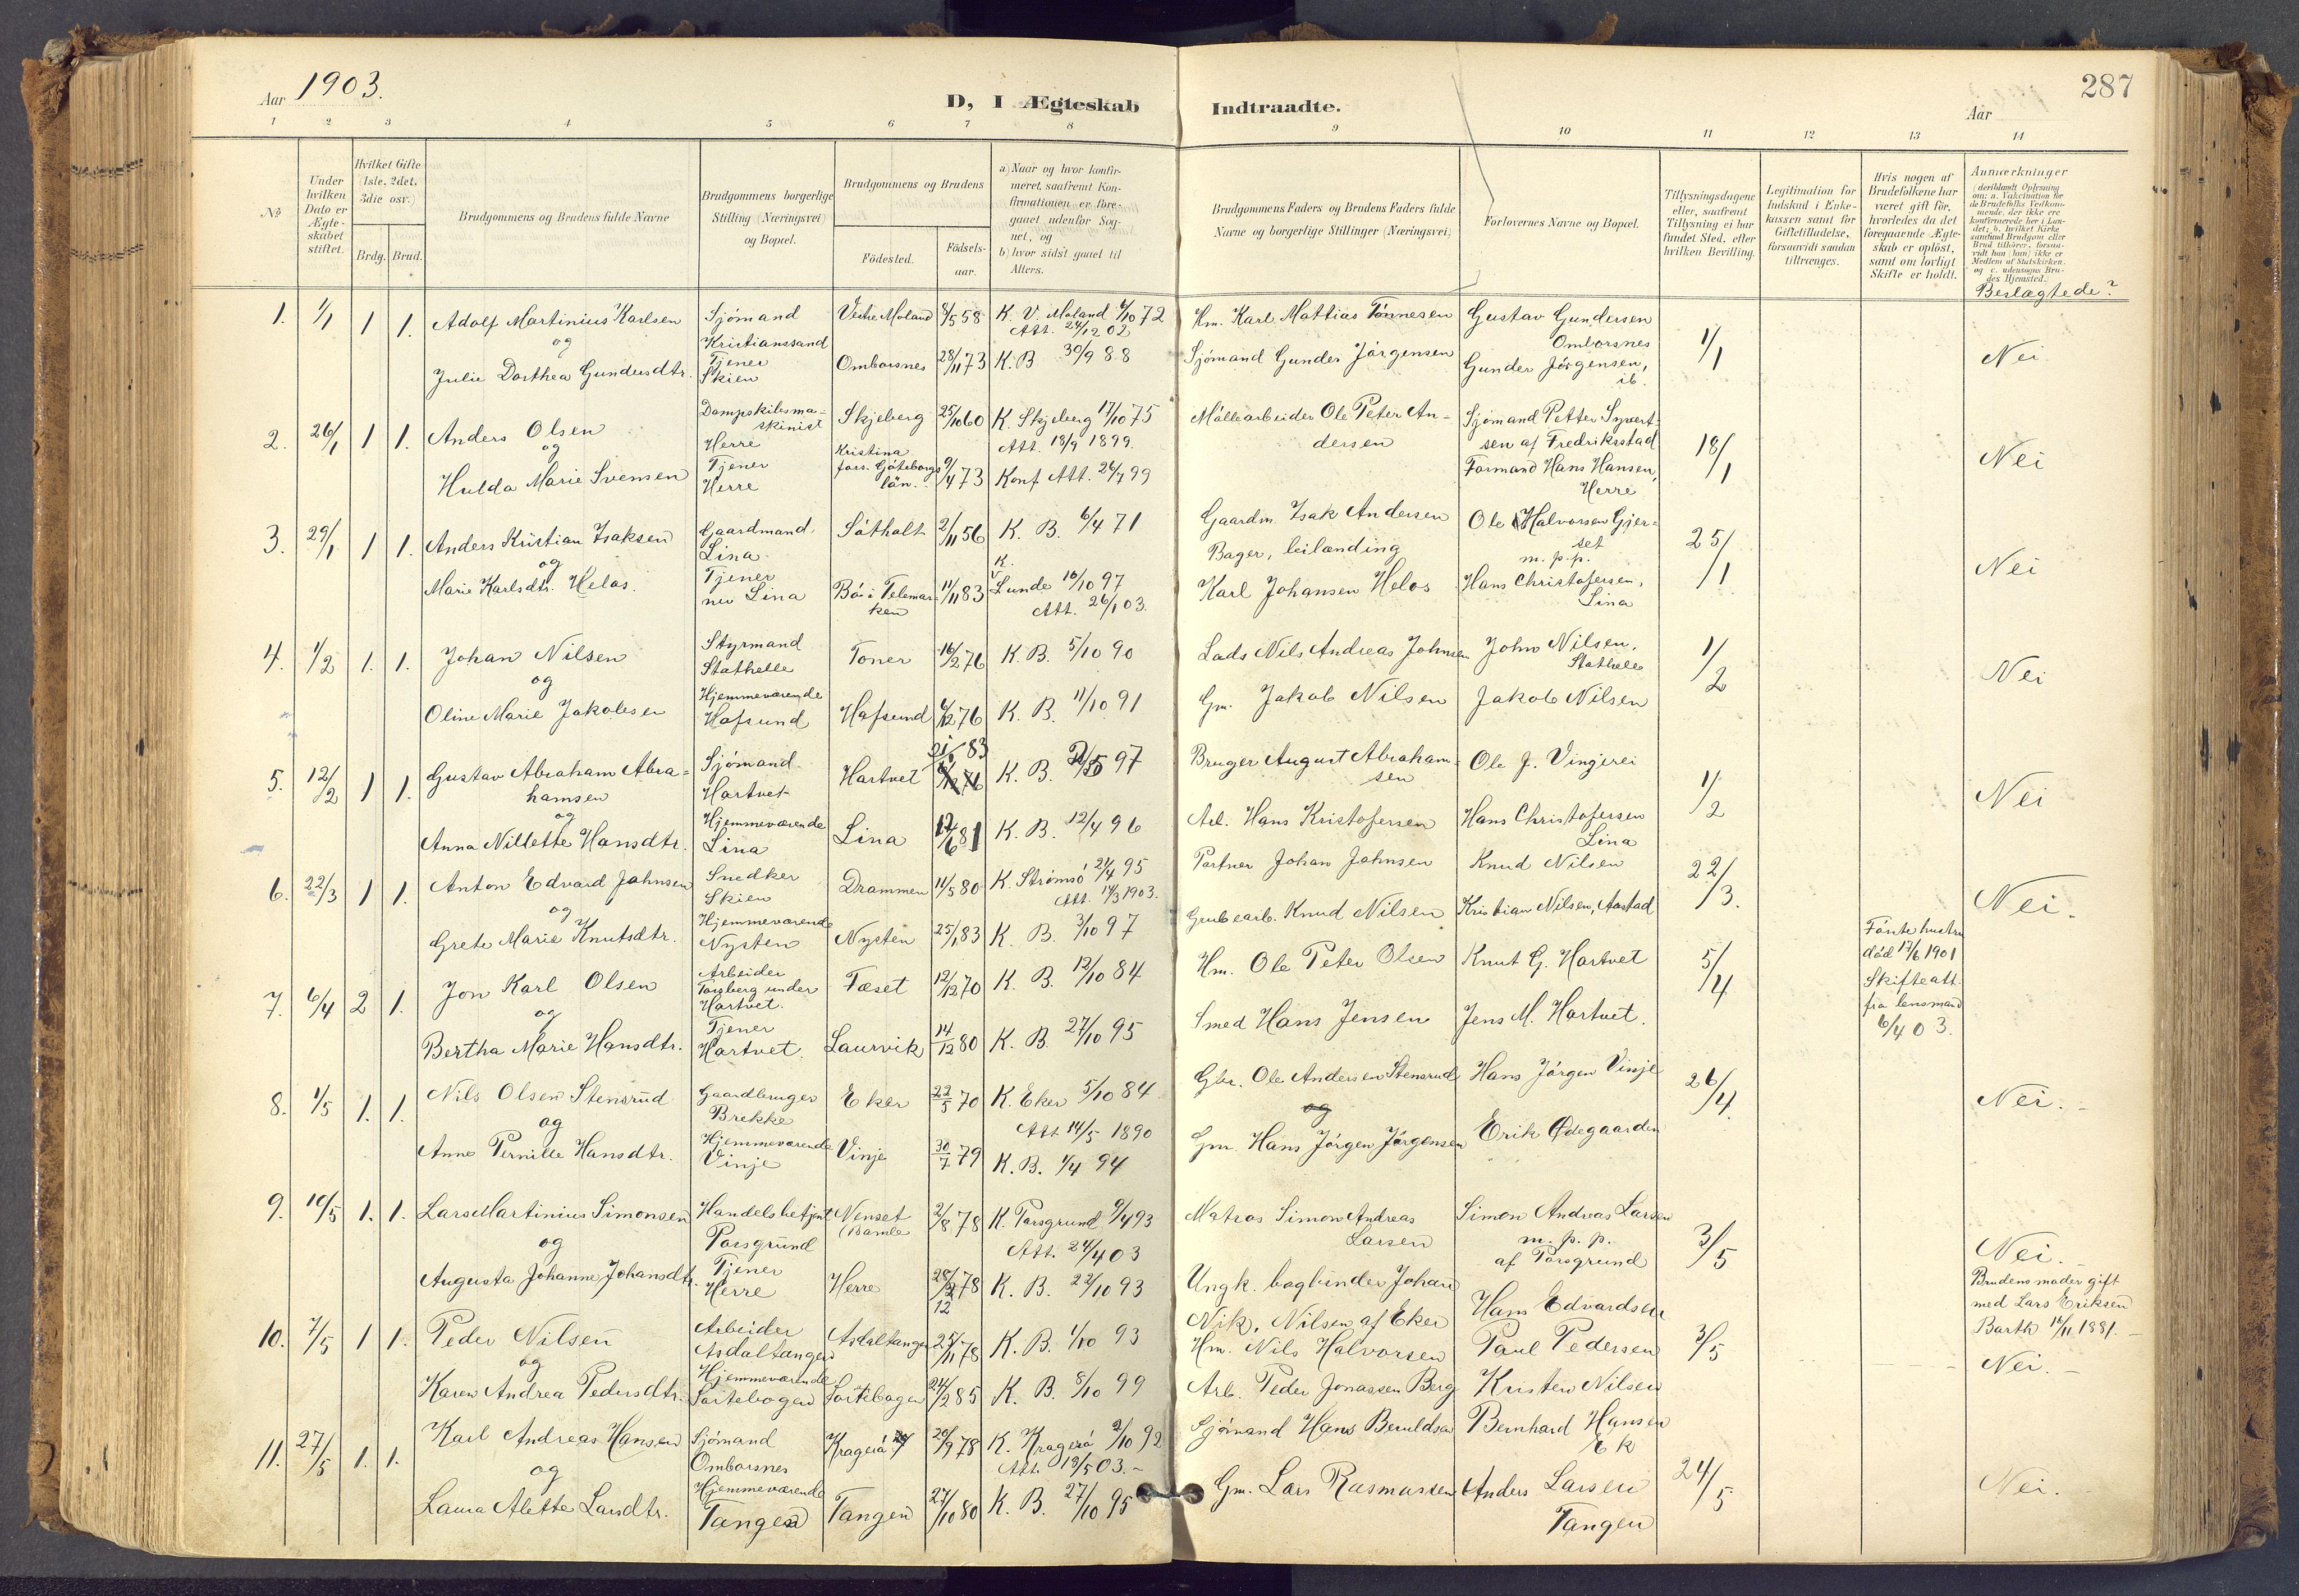 SAKO, Bamble kirkebøker, F/Fa/L0009: Ministerialbok nr. I 9, 1901-1917, s. 287